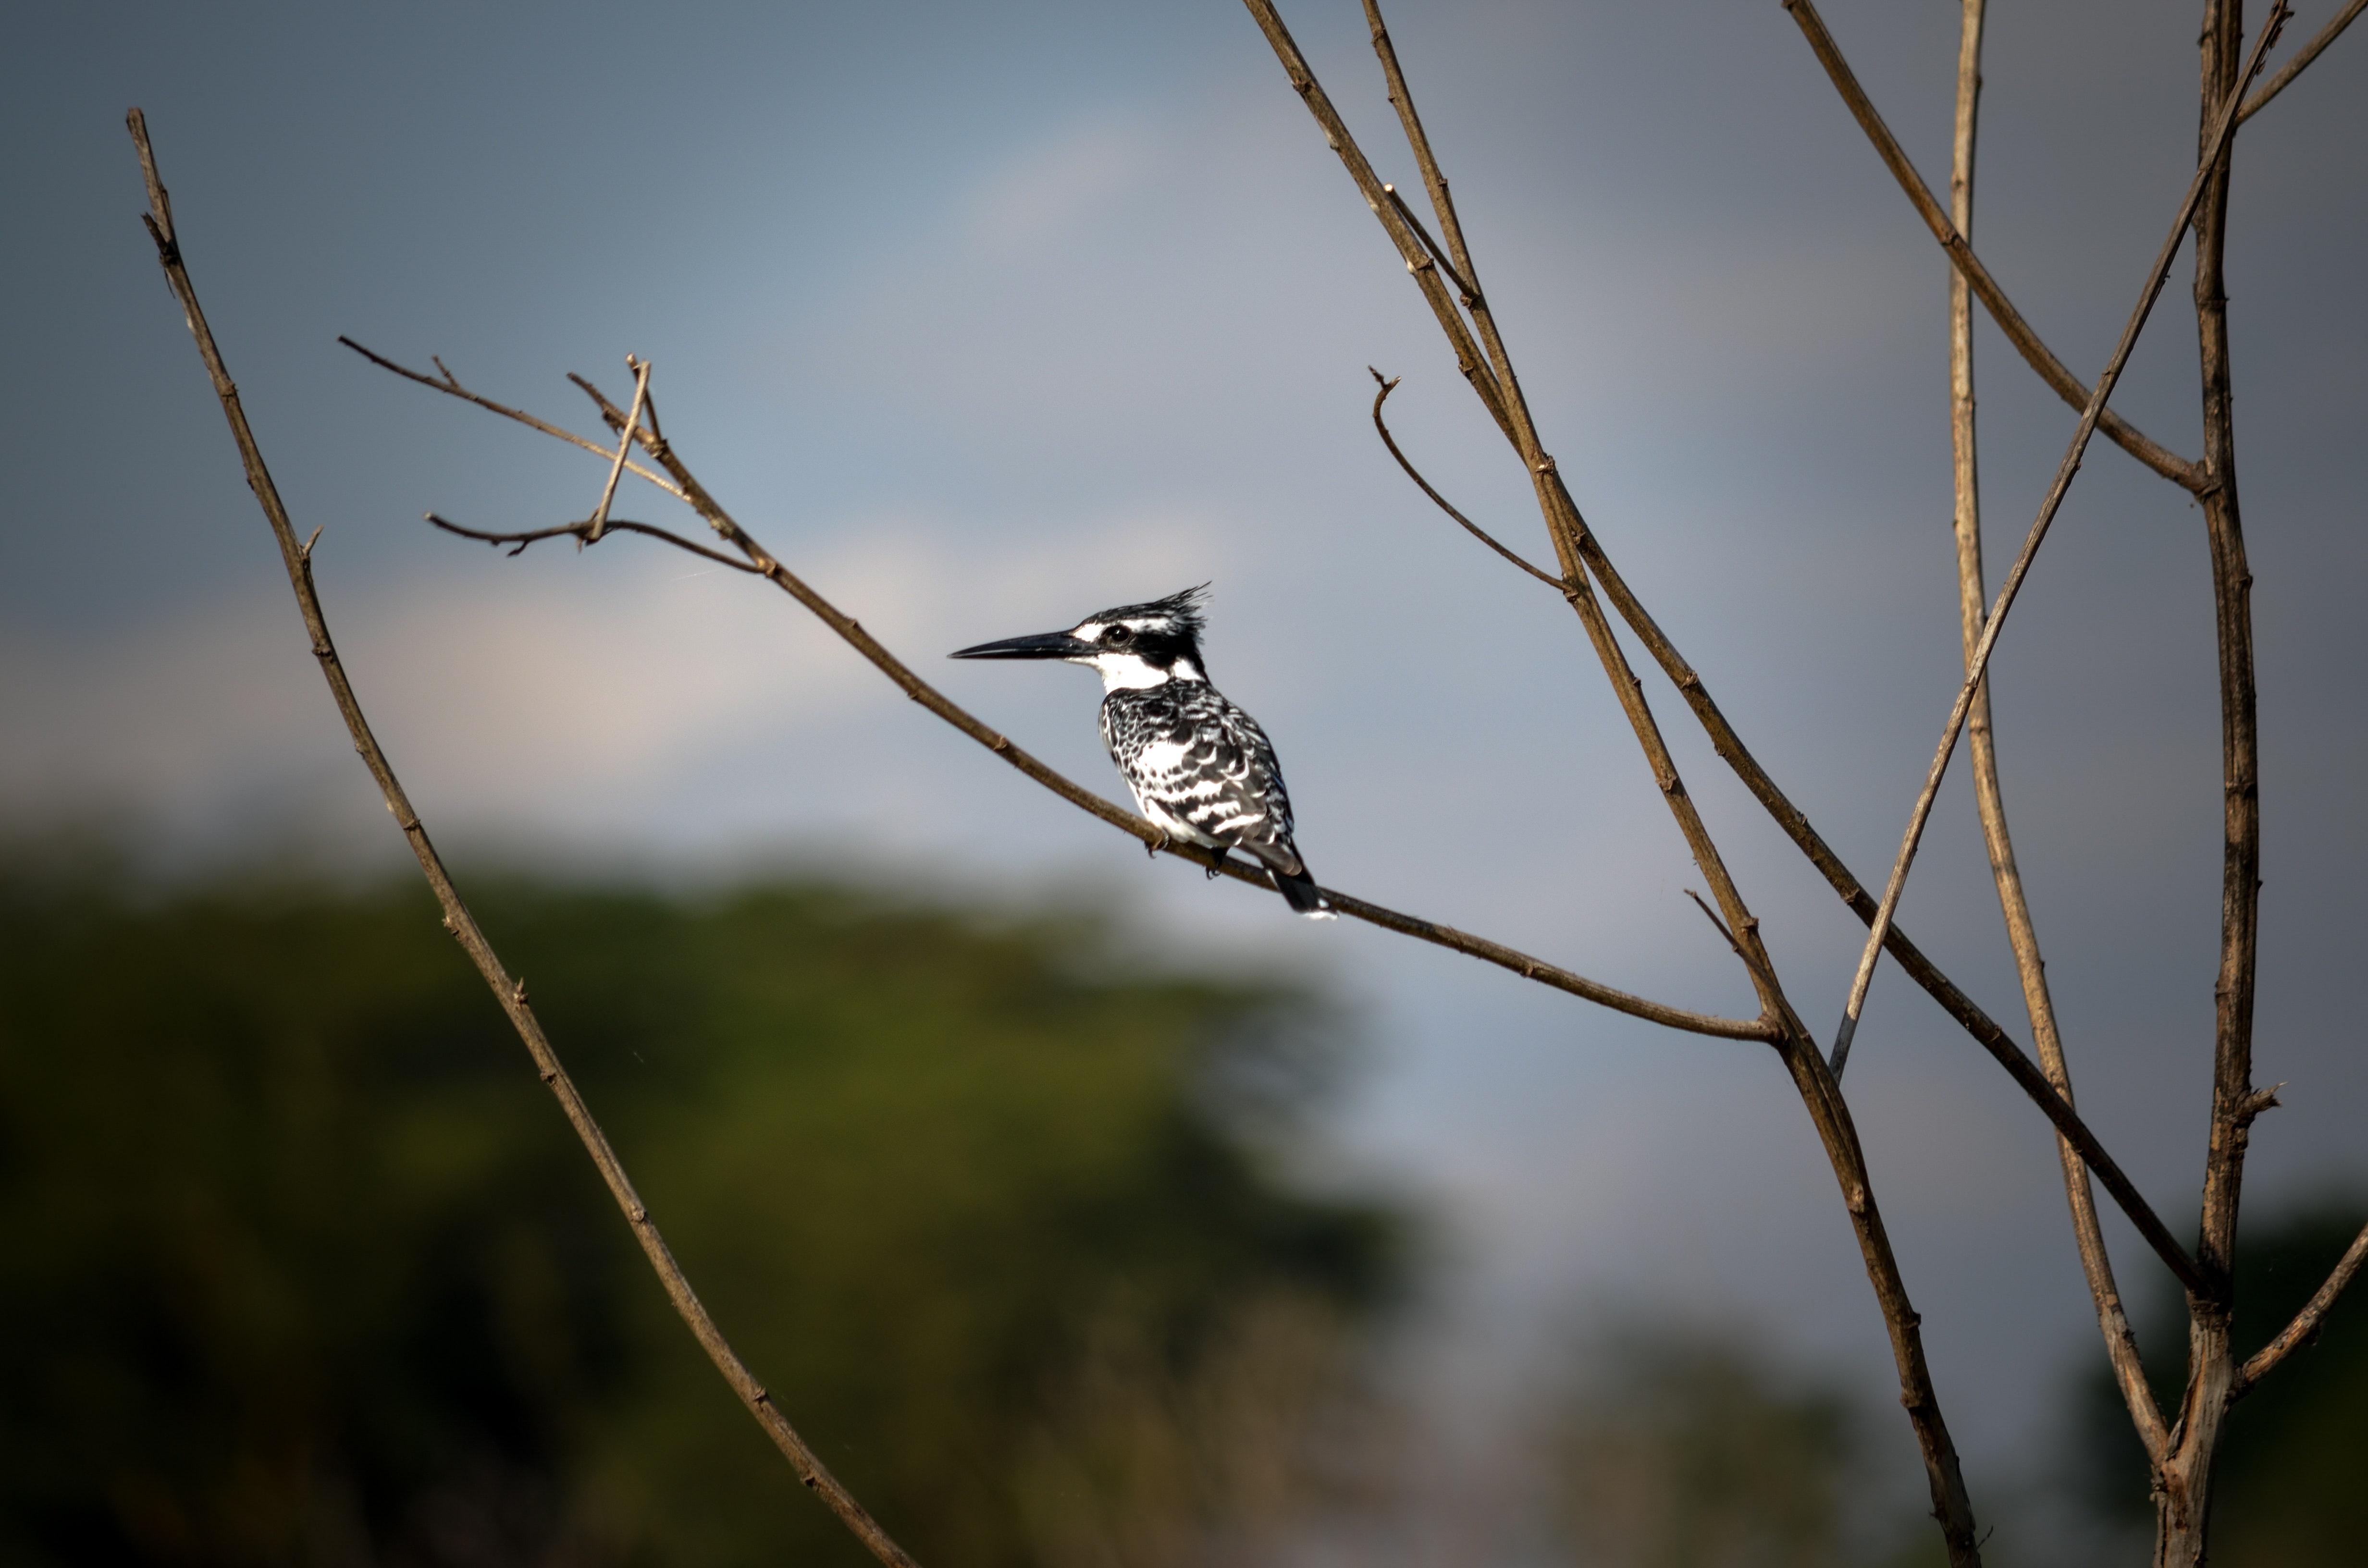 White and black bird on brown tree stem photo